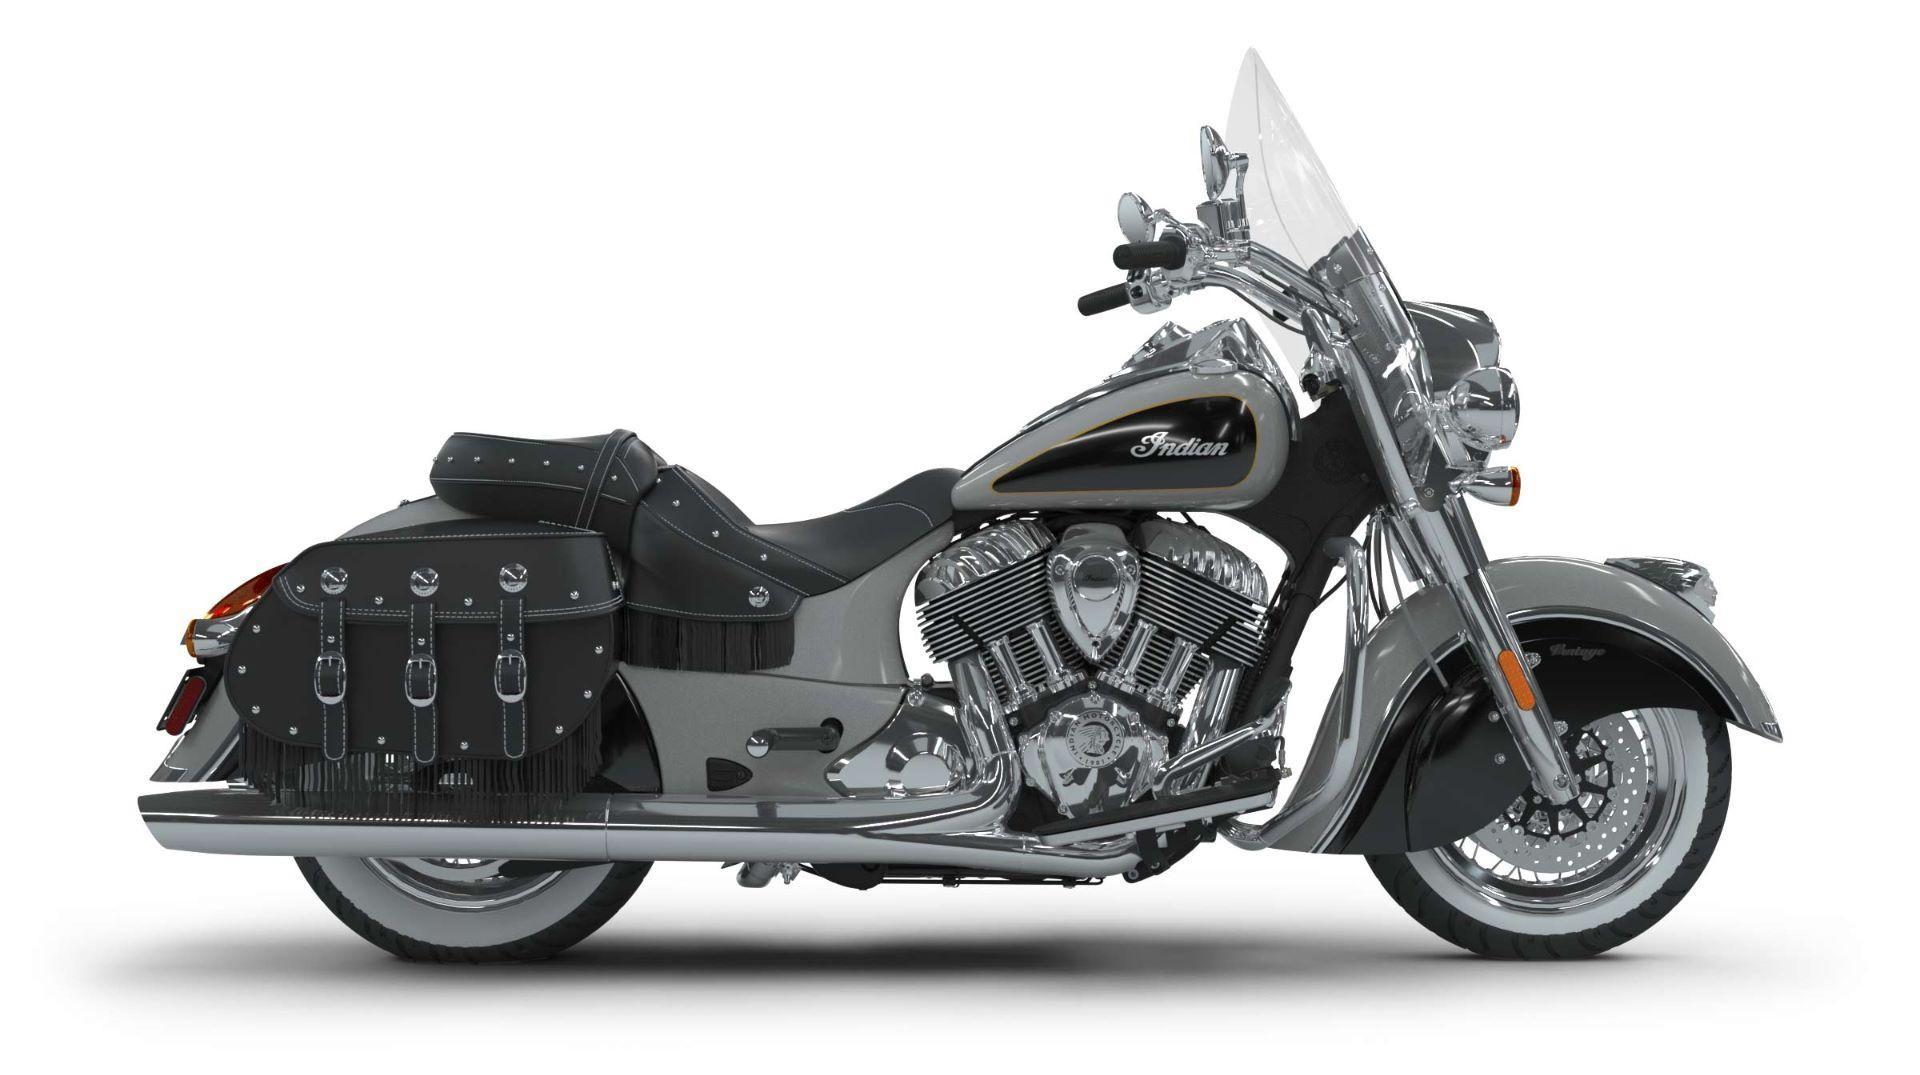 moto neuve acheter indian chief vintage arrigoni sport gmbh adliswil. Black Bedroom Furniture Sets. Home Design Ideas